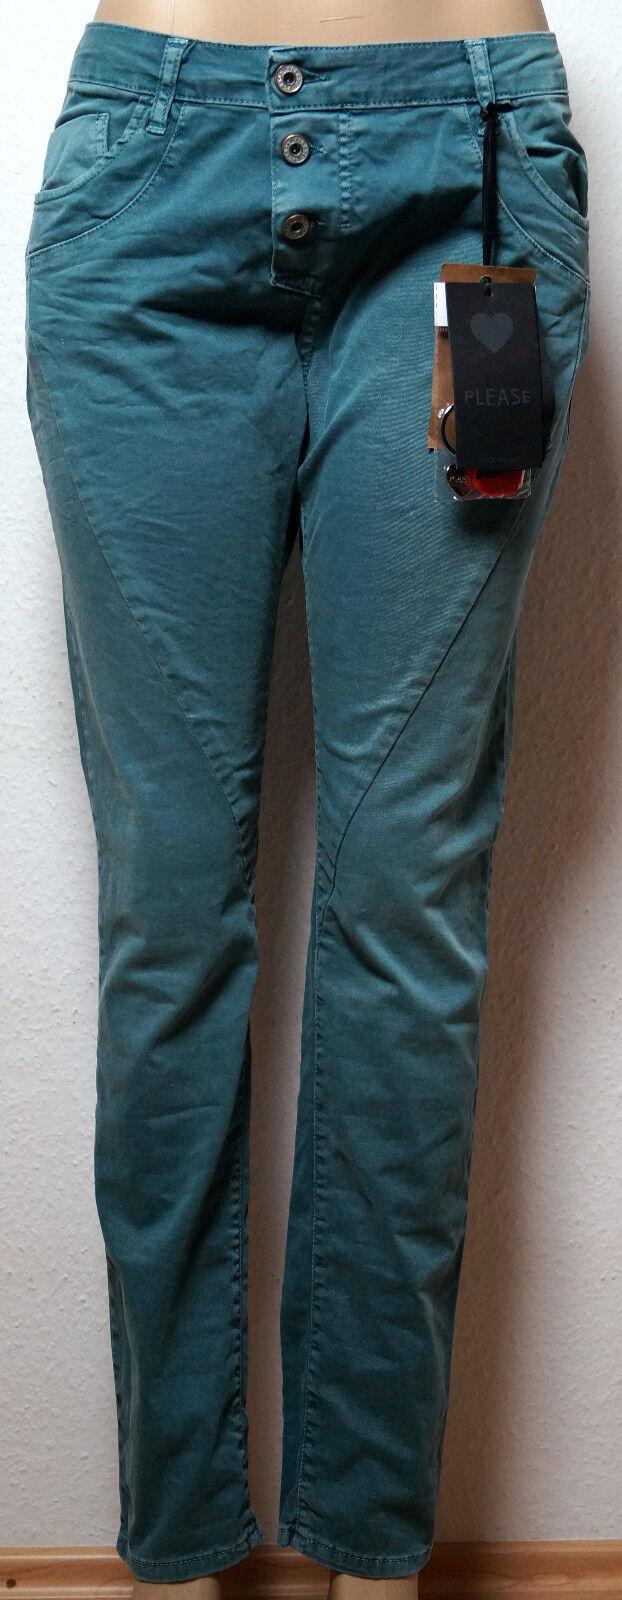 PLEASE wunderschöne Damen Jeans P 78A petrol Gr. M NP.  99 95